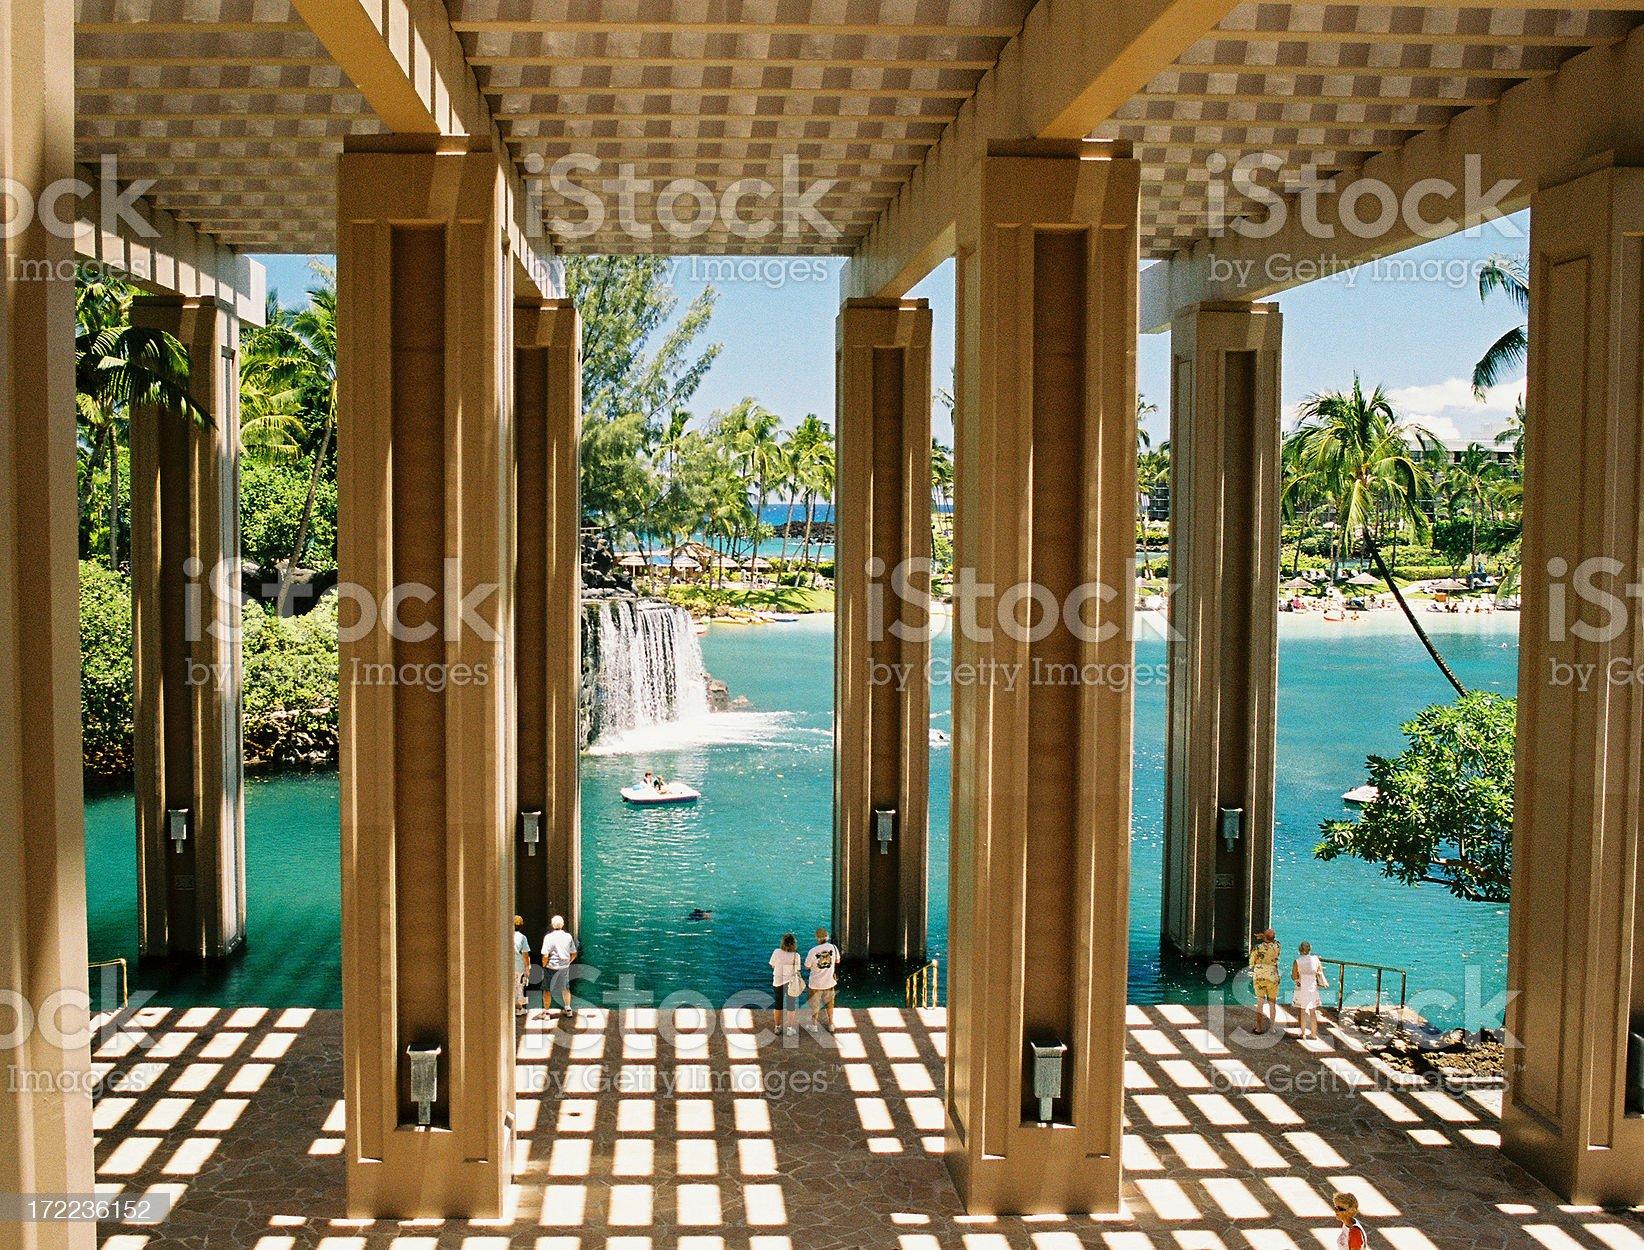 Hawaii hotel, tourists and waterfall royalty-free stock photo